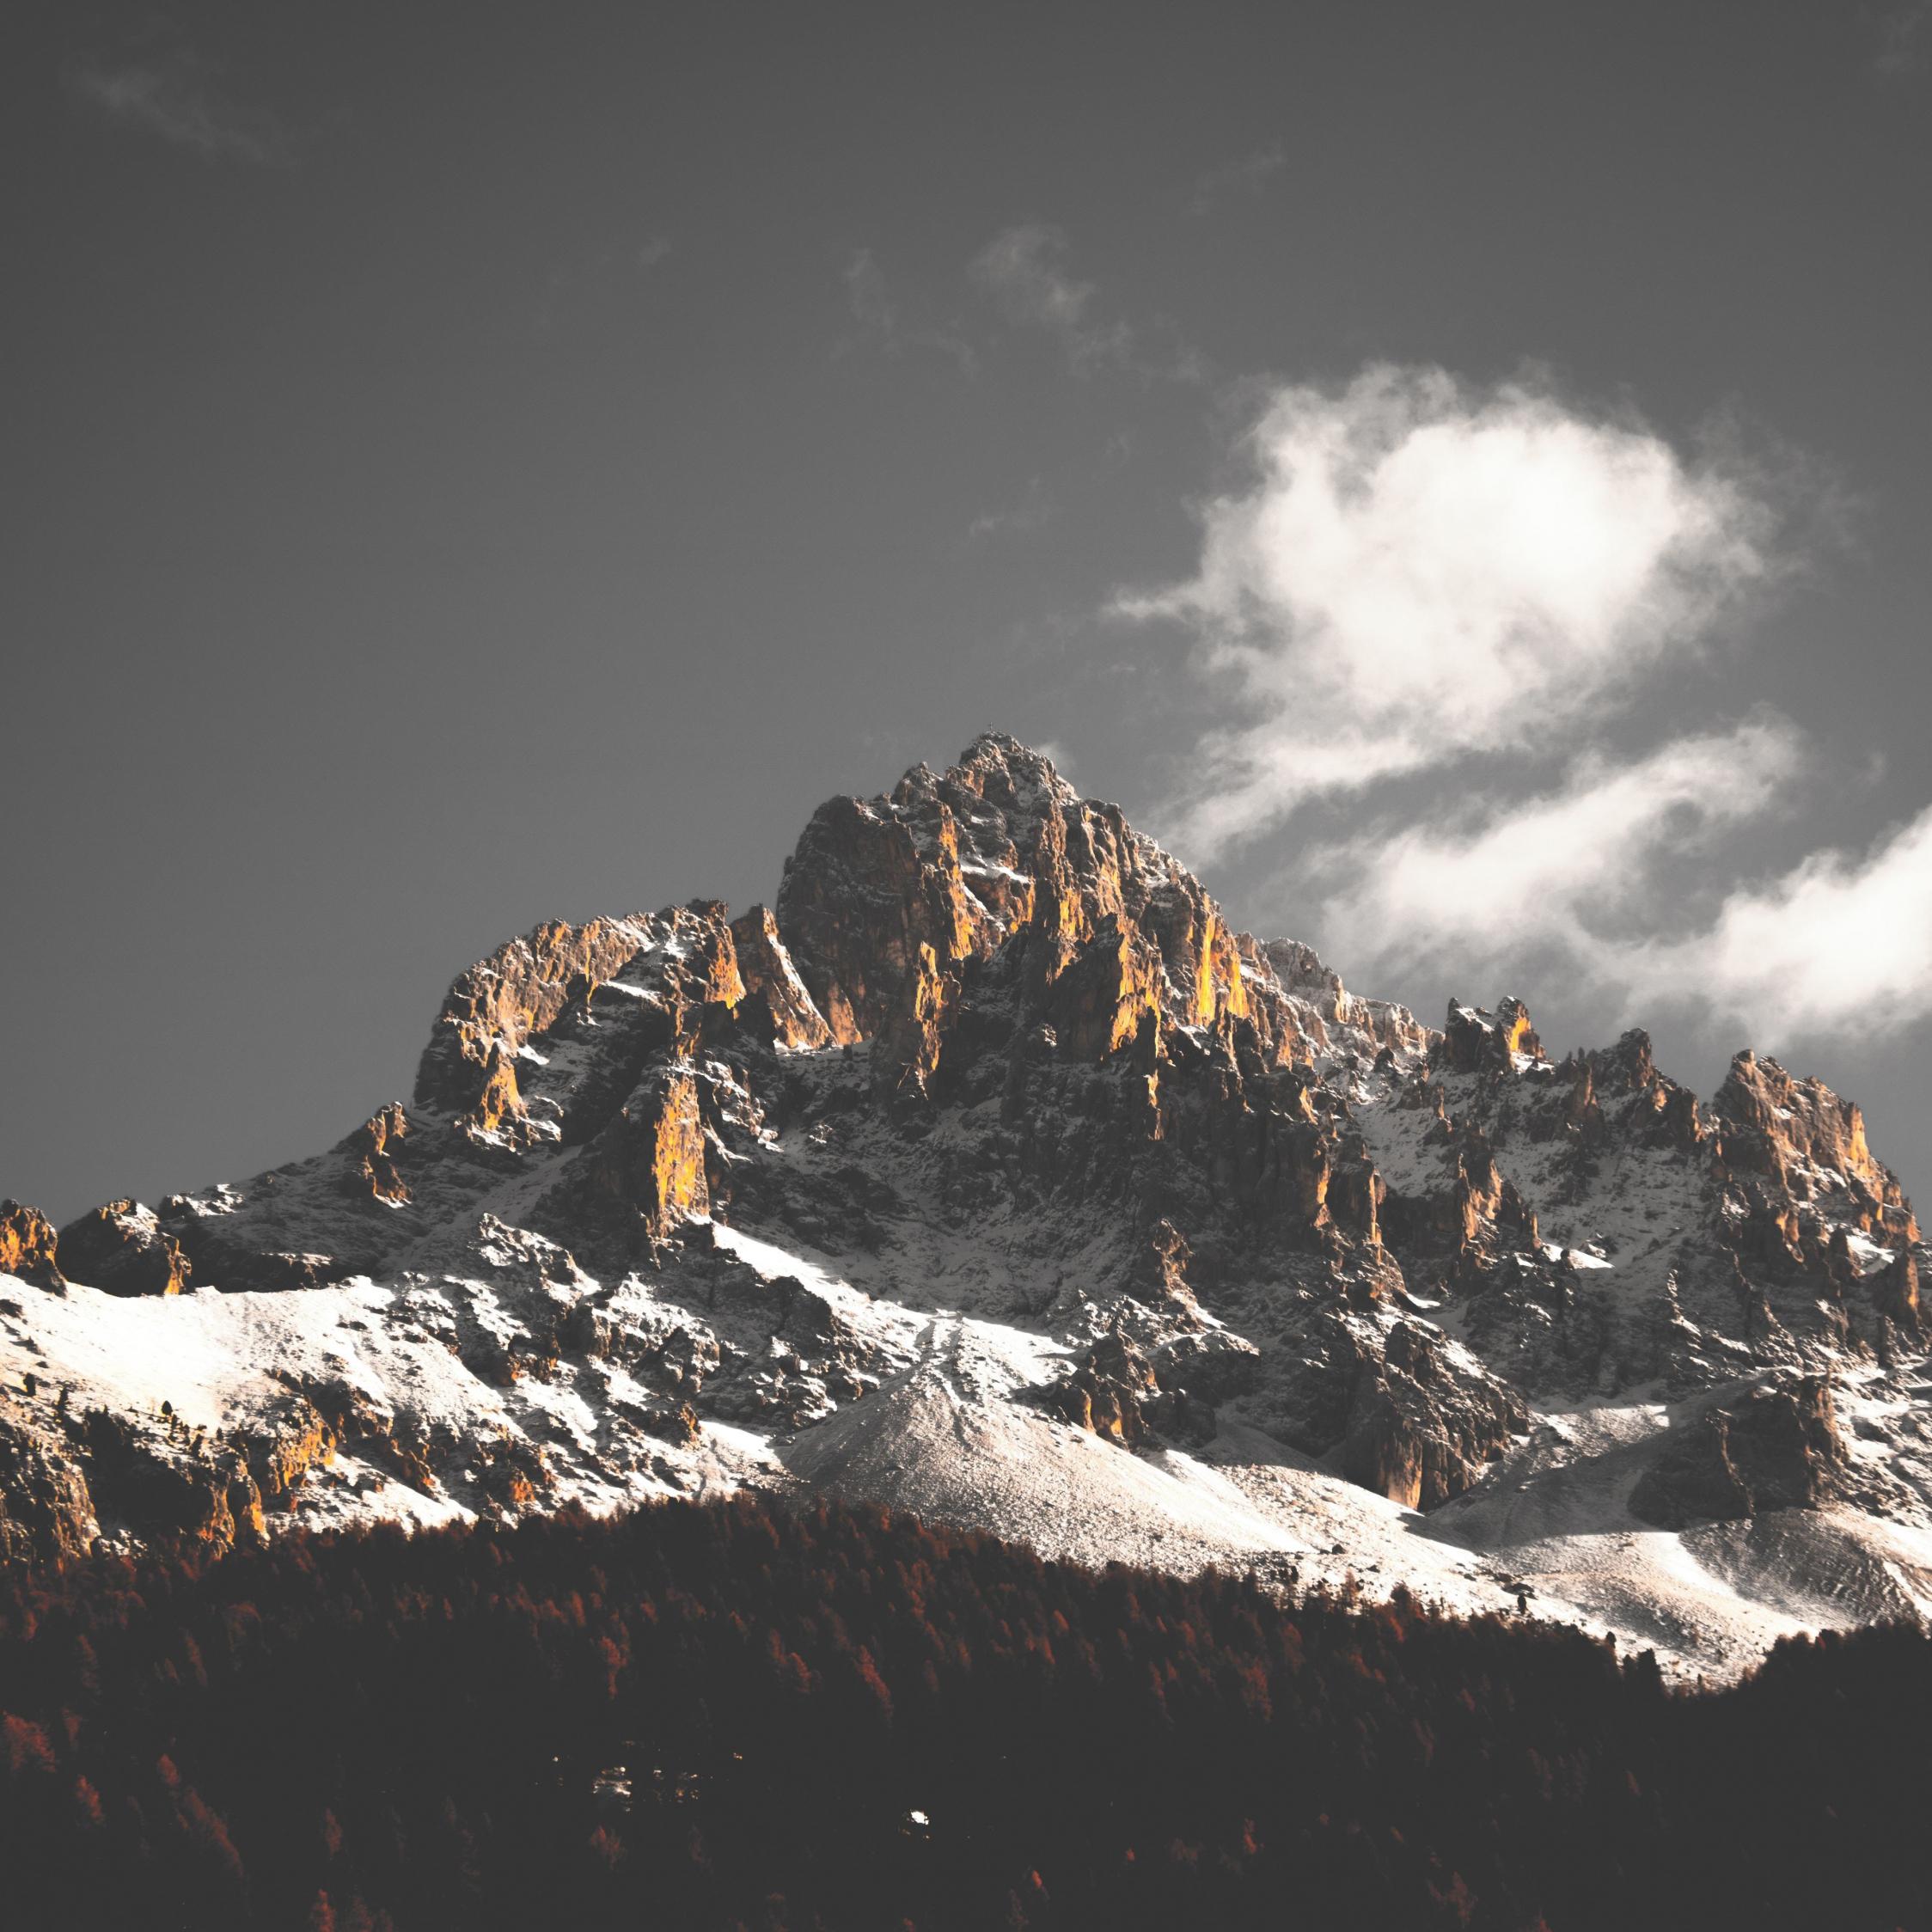 Mountain cliffs, nature, sky, clouds, tree, 2248x2248 wallpaper